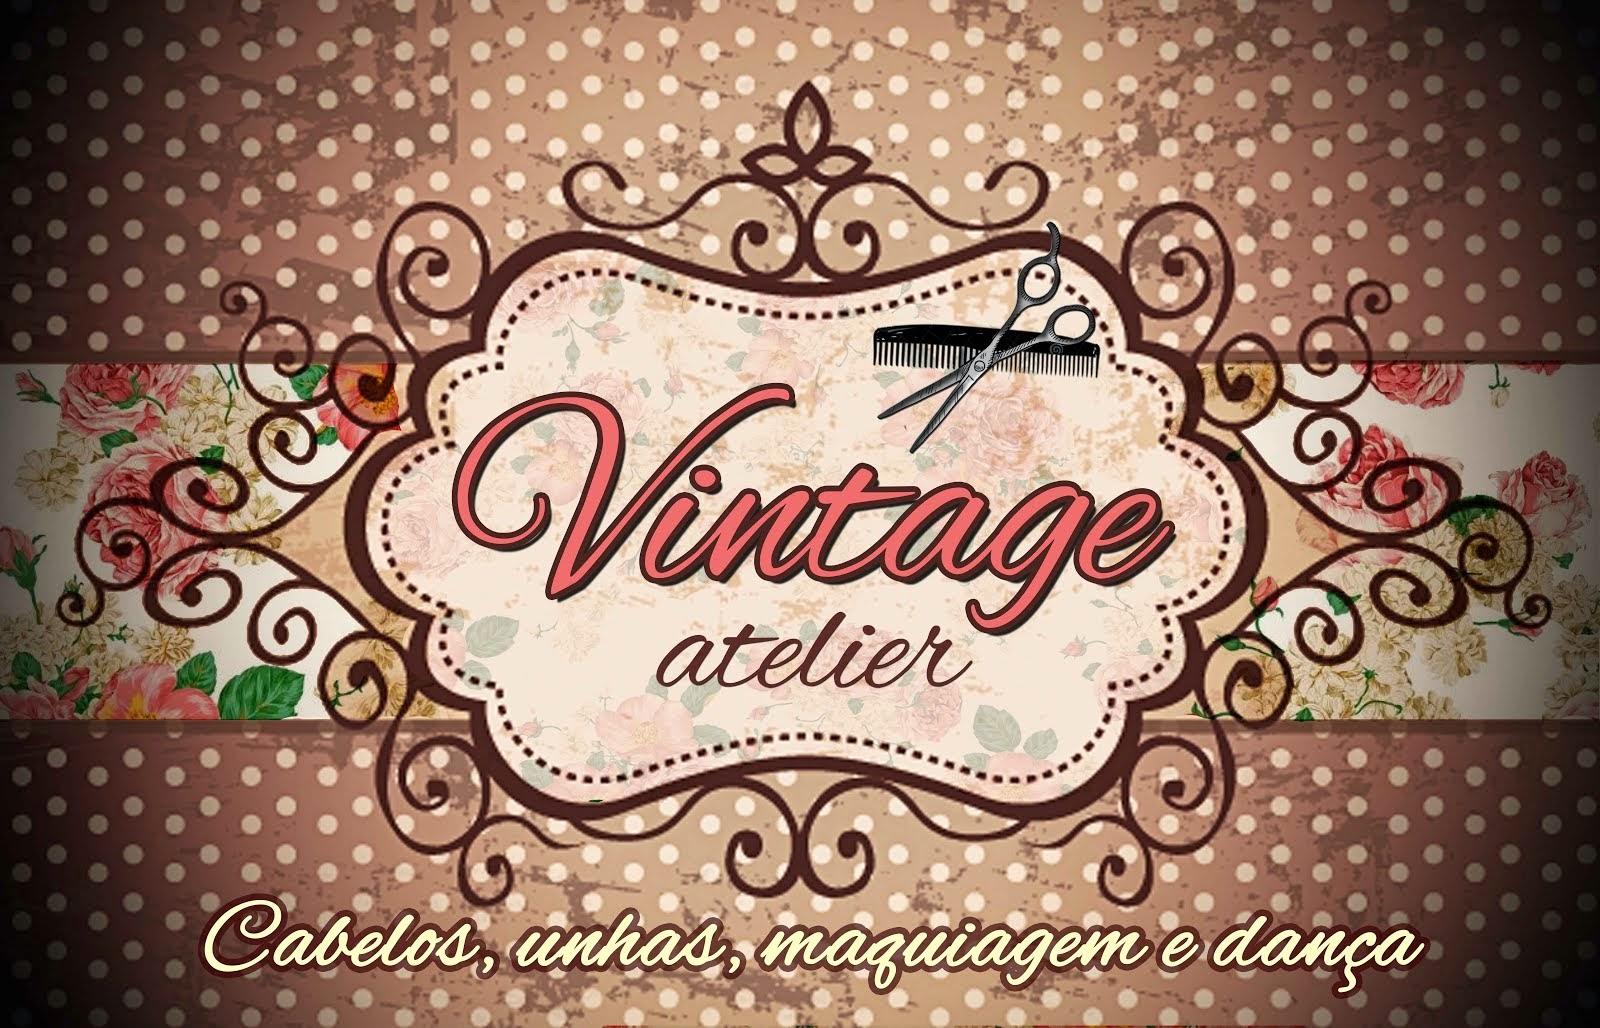 Vintage Atelier